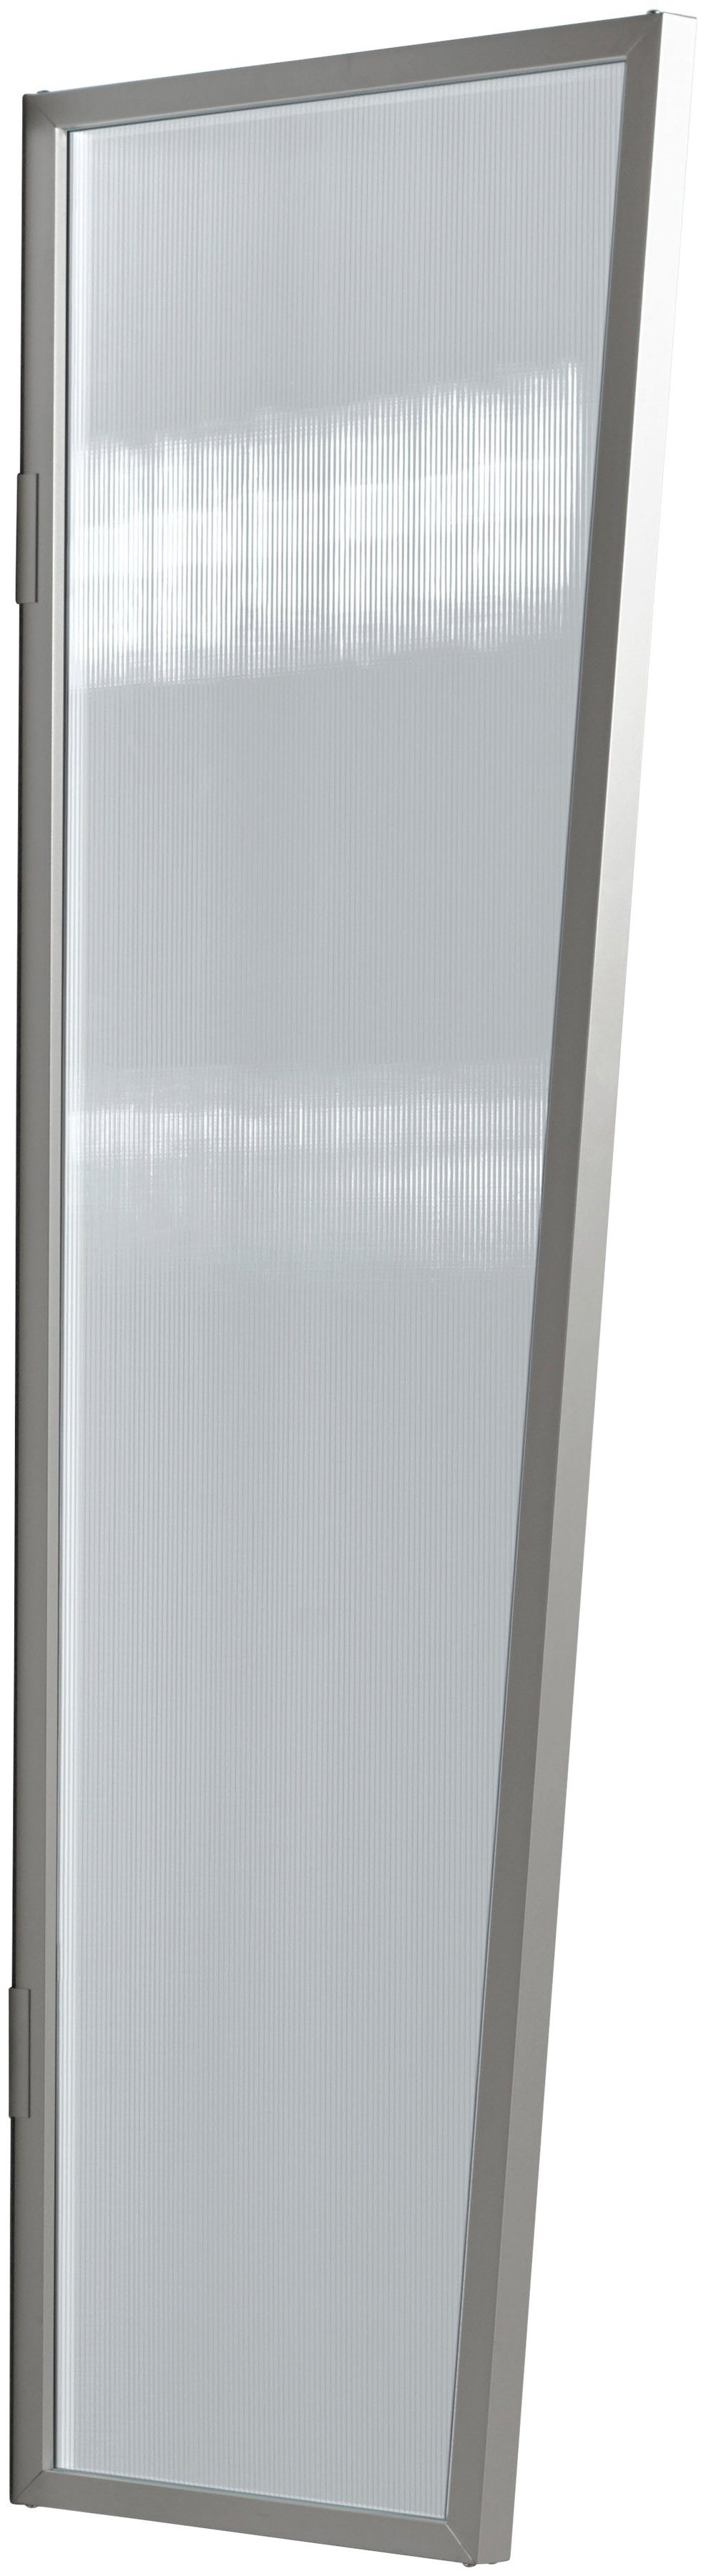 Seitenblende »B2 PC klar«, BxH: 60x175 cm, silberfarben/transparent